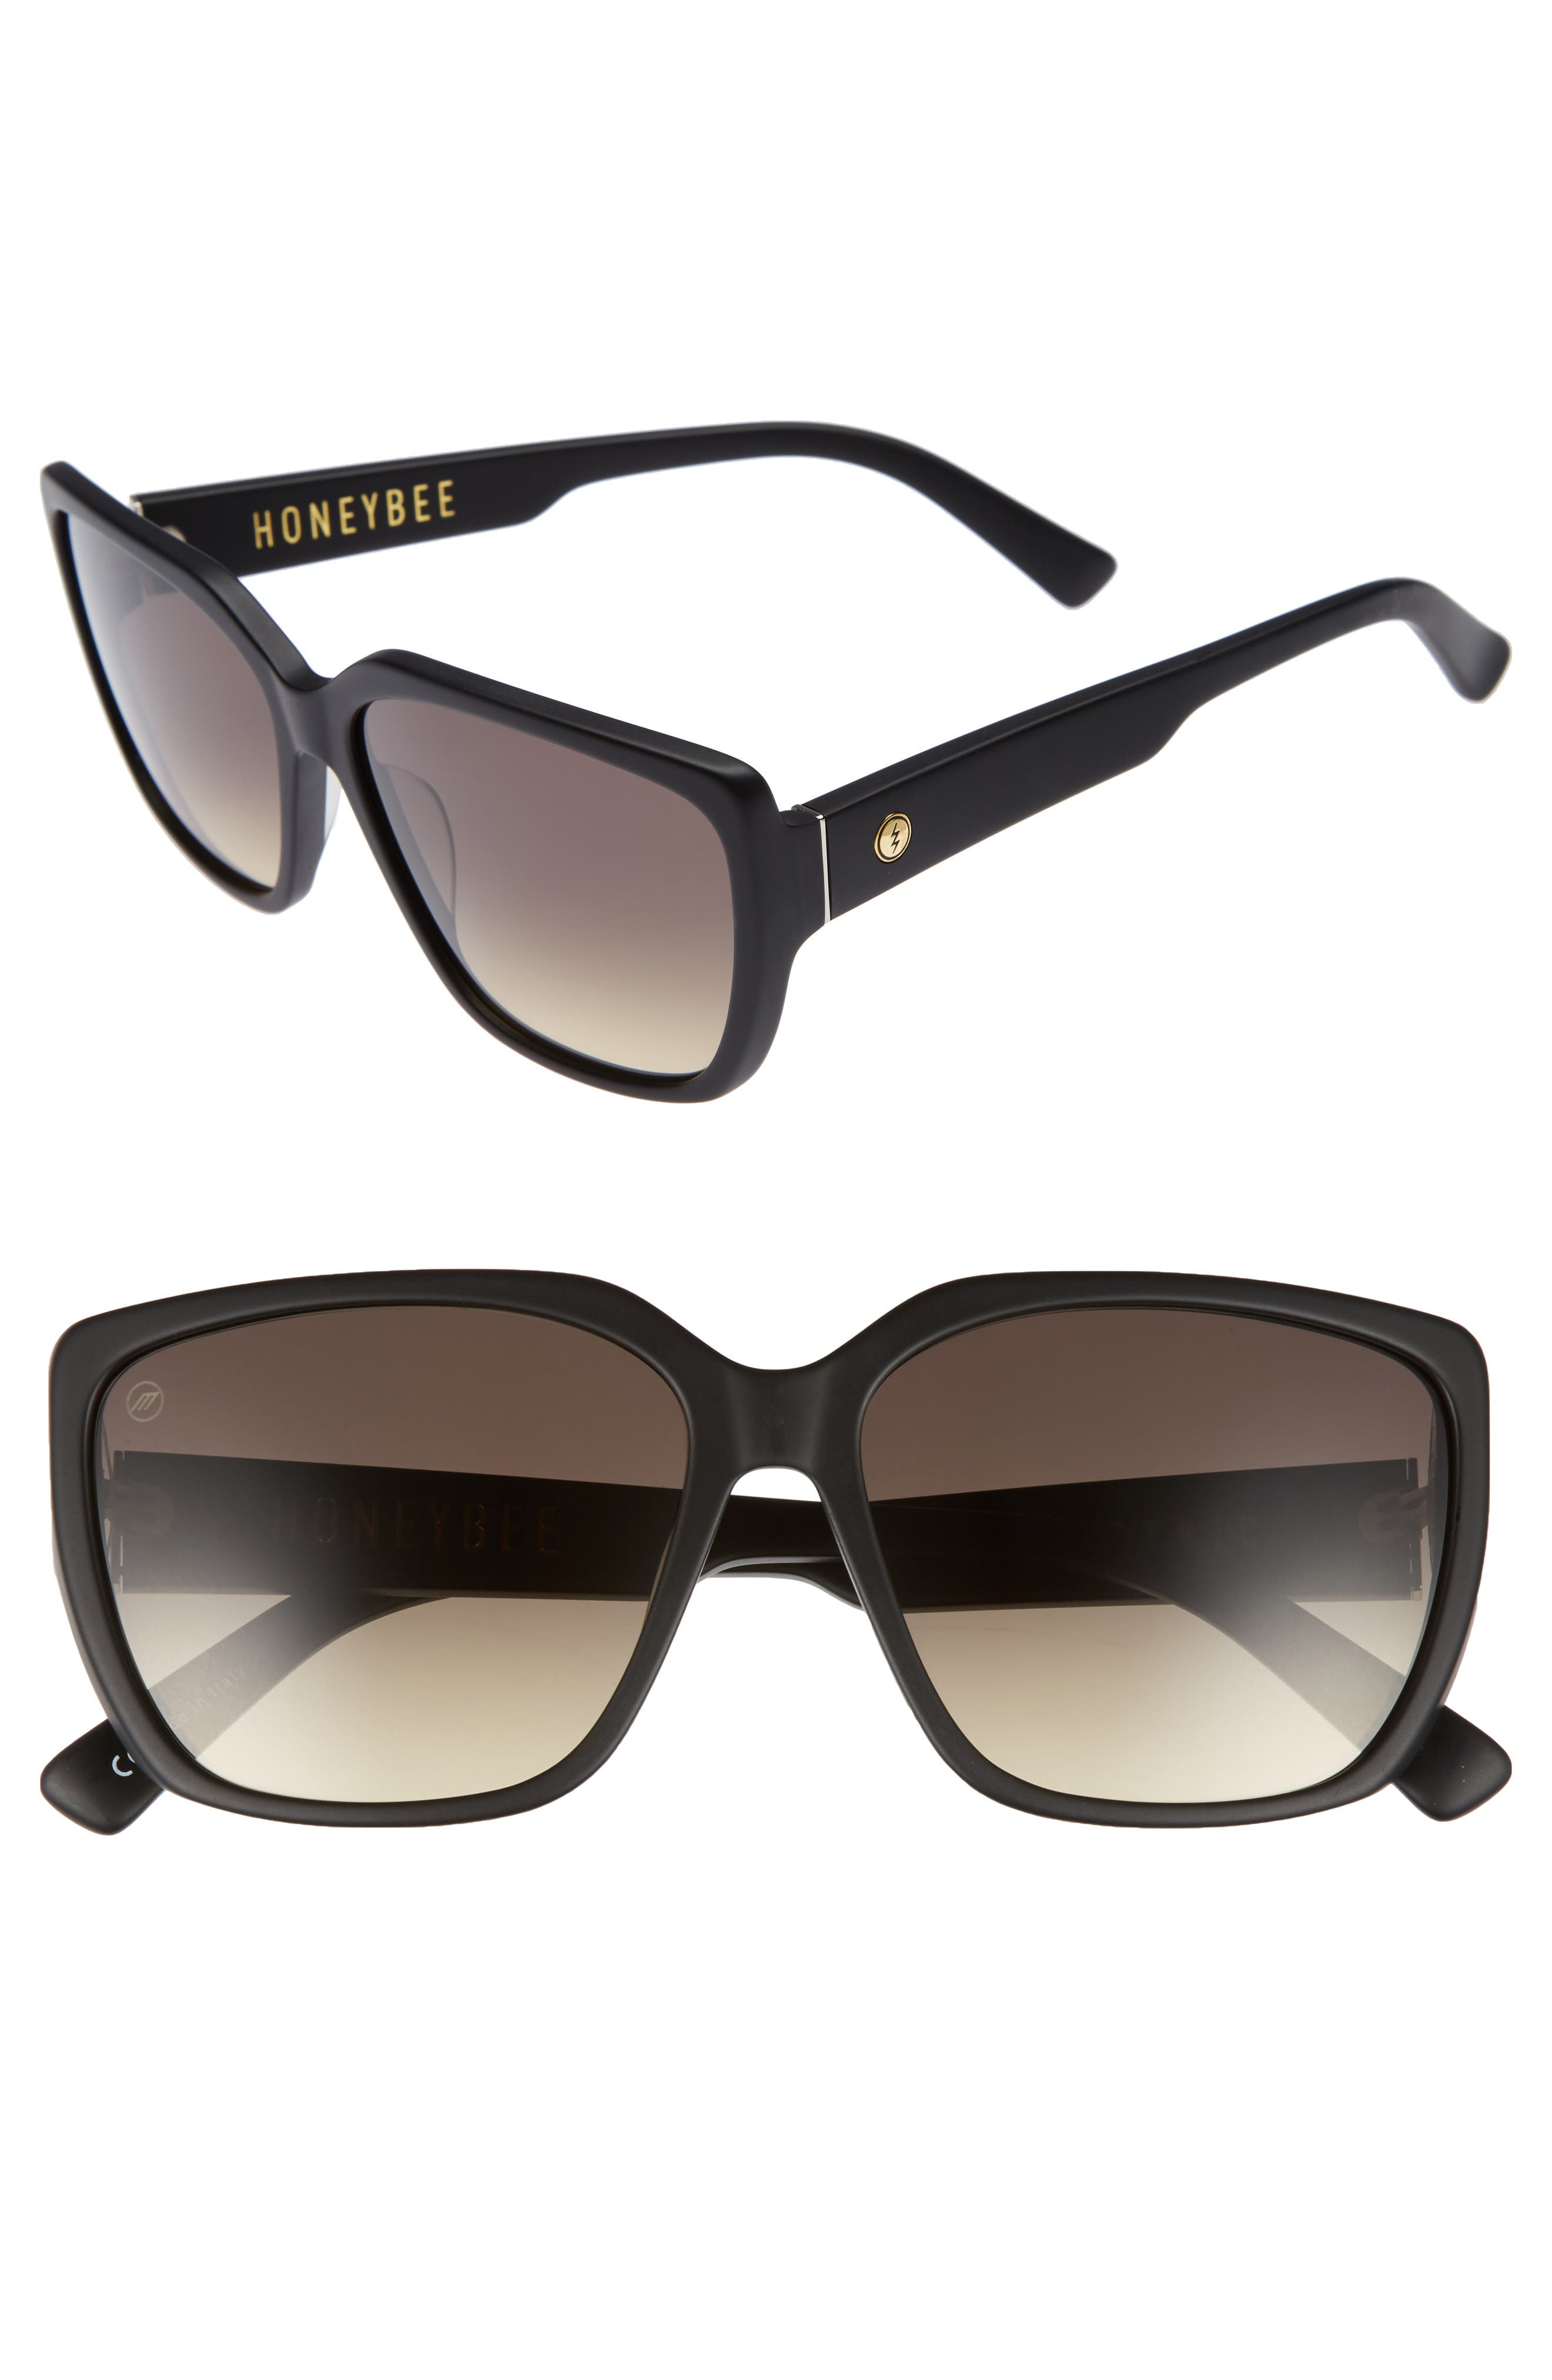 Honey Bee 60mm Mirrored Sunglasses,                         Main,                         color, Matte Black/ Black Gradient